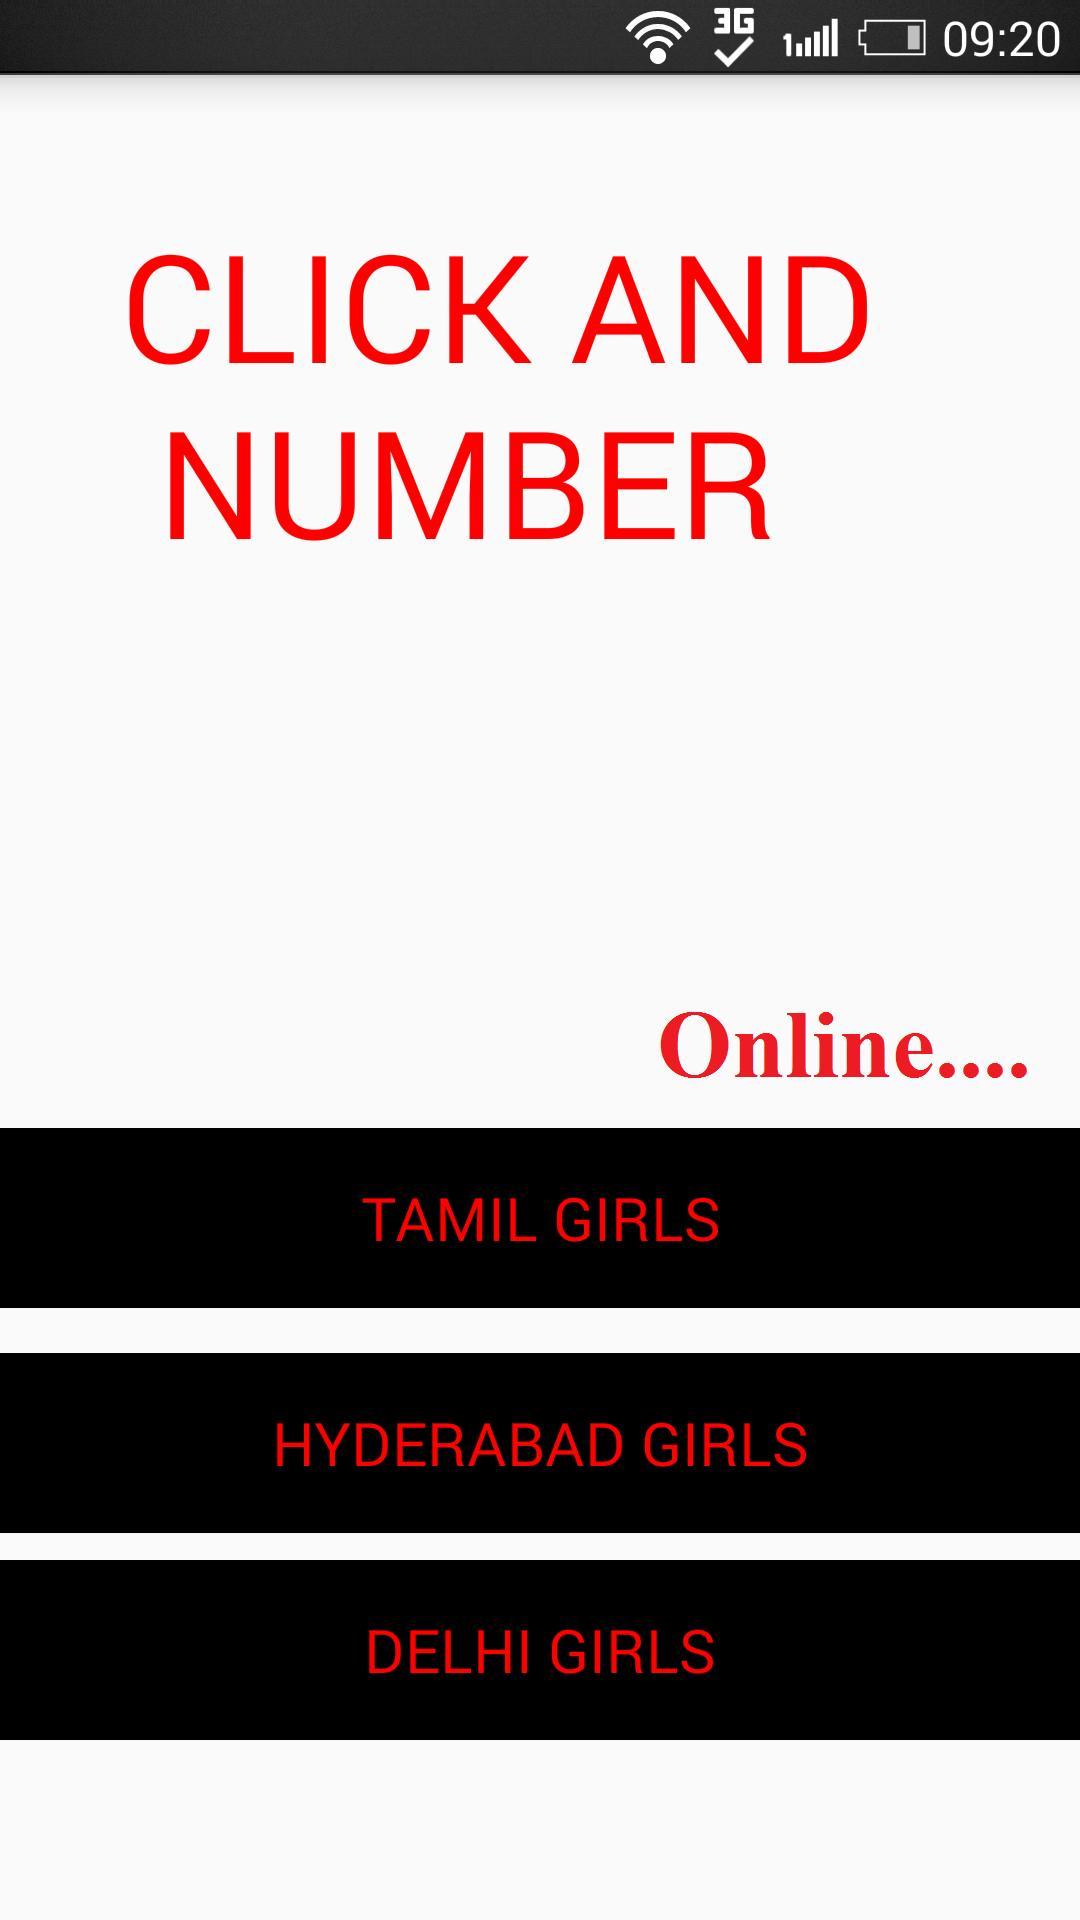 Hyderabad girls chat